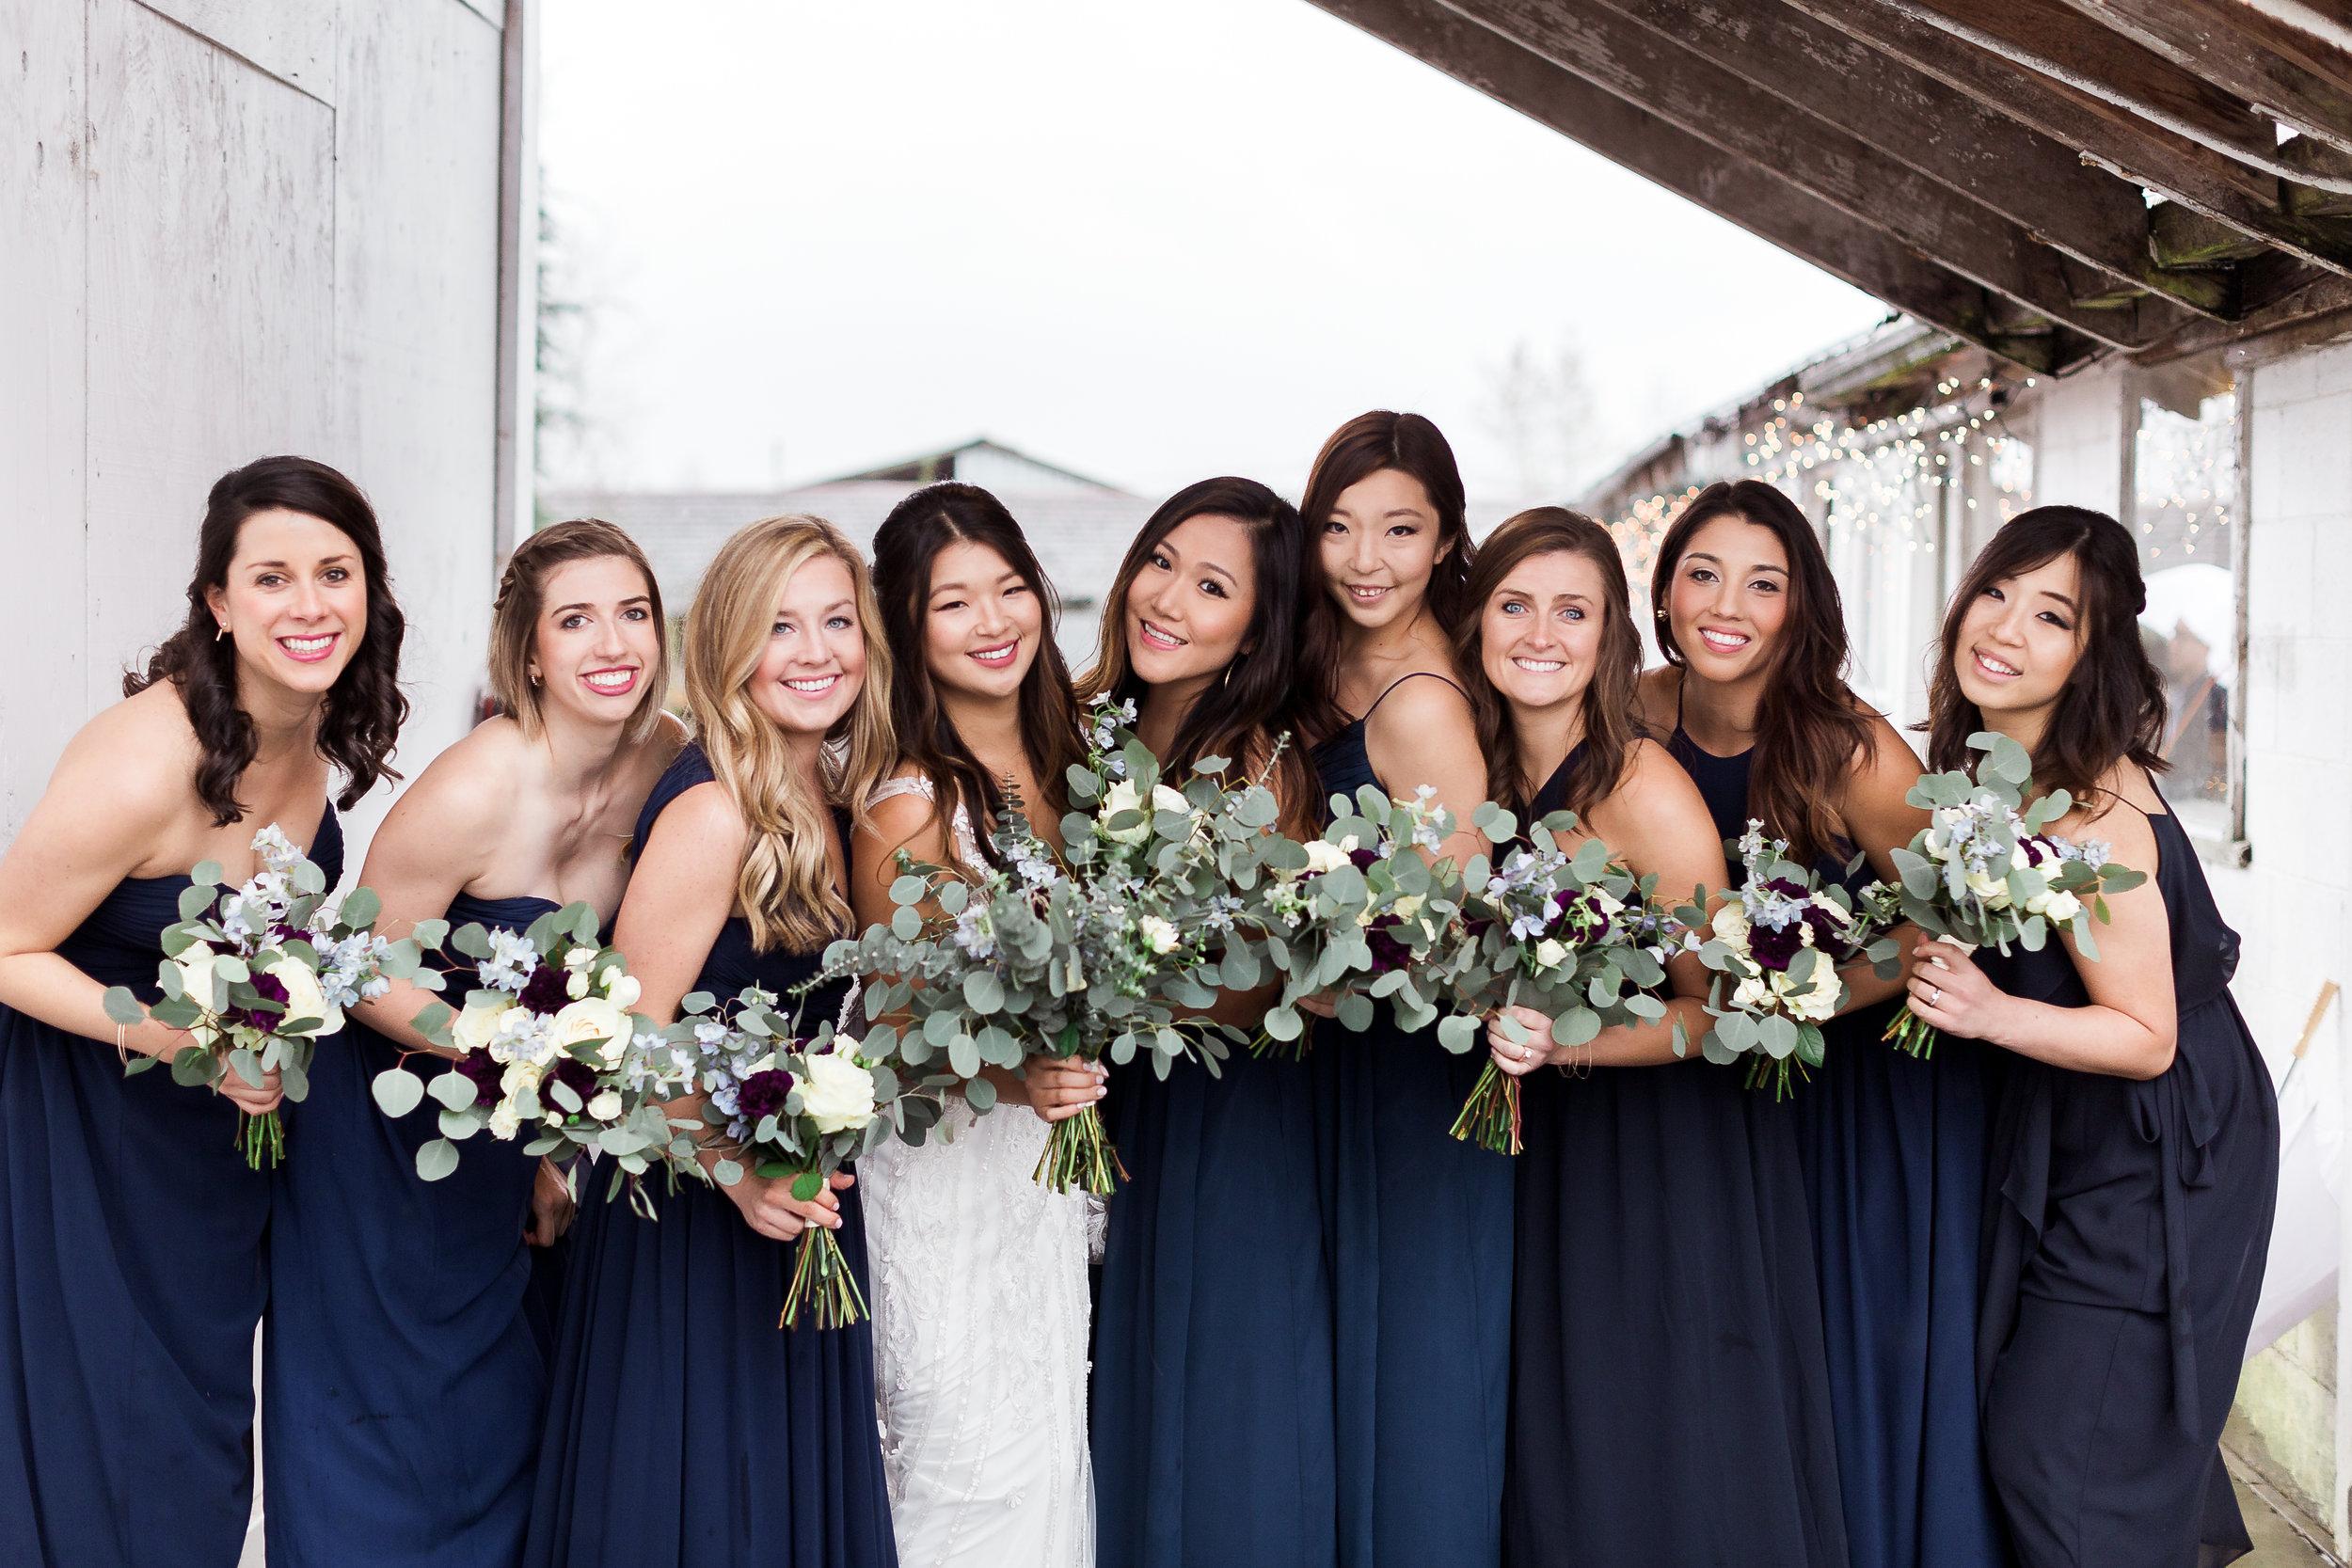 AlessandraArendtPhotography_Copyright2016_Chris-and-Deena_Wedding_HighResolution-361.jpg